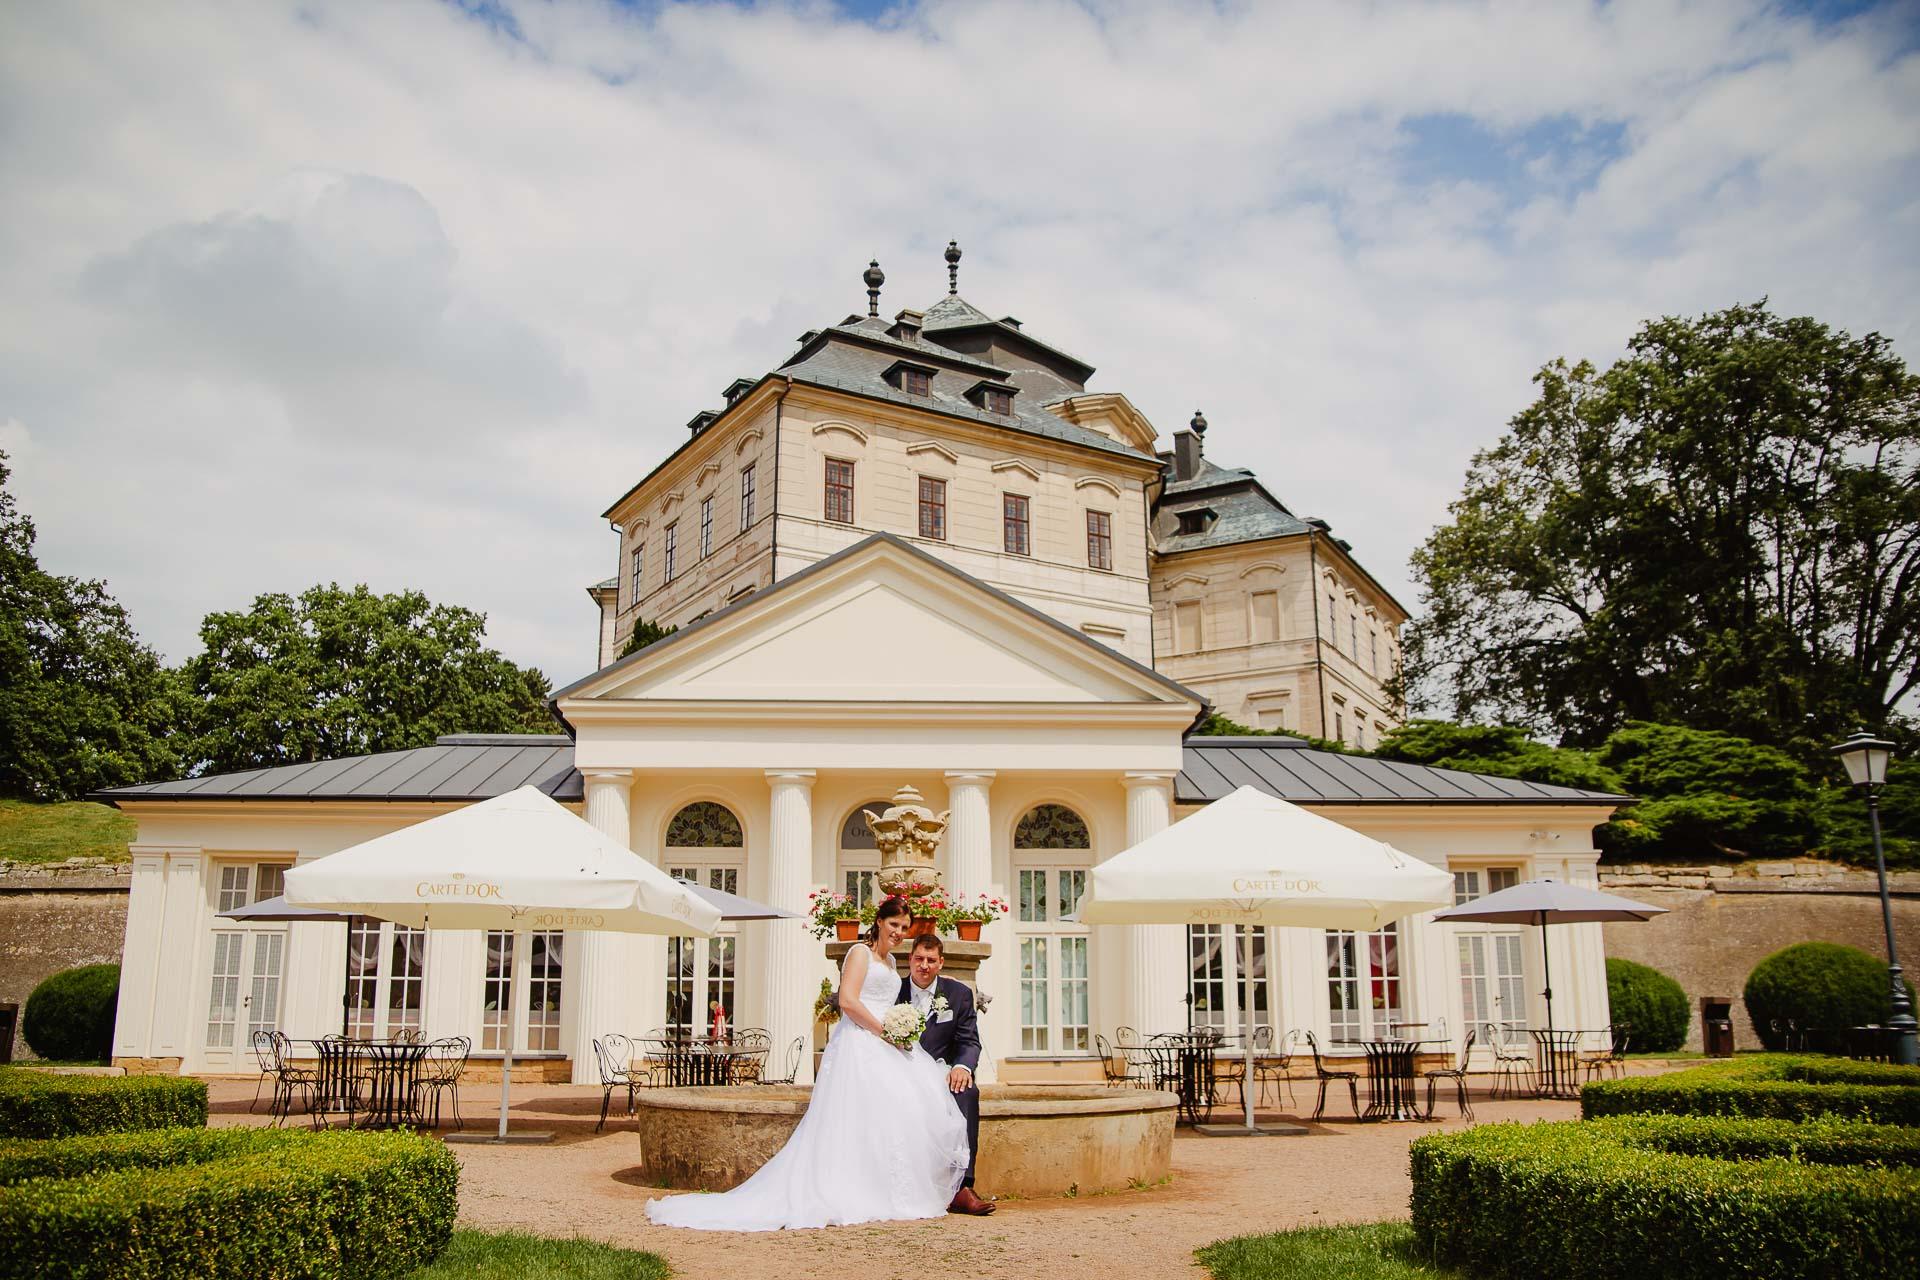 Svatební-fotograf-zámek-Karlova-Koruna-Chlumec-nad-Cidlinou-158